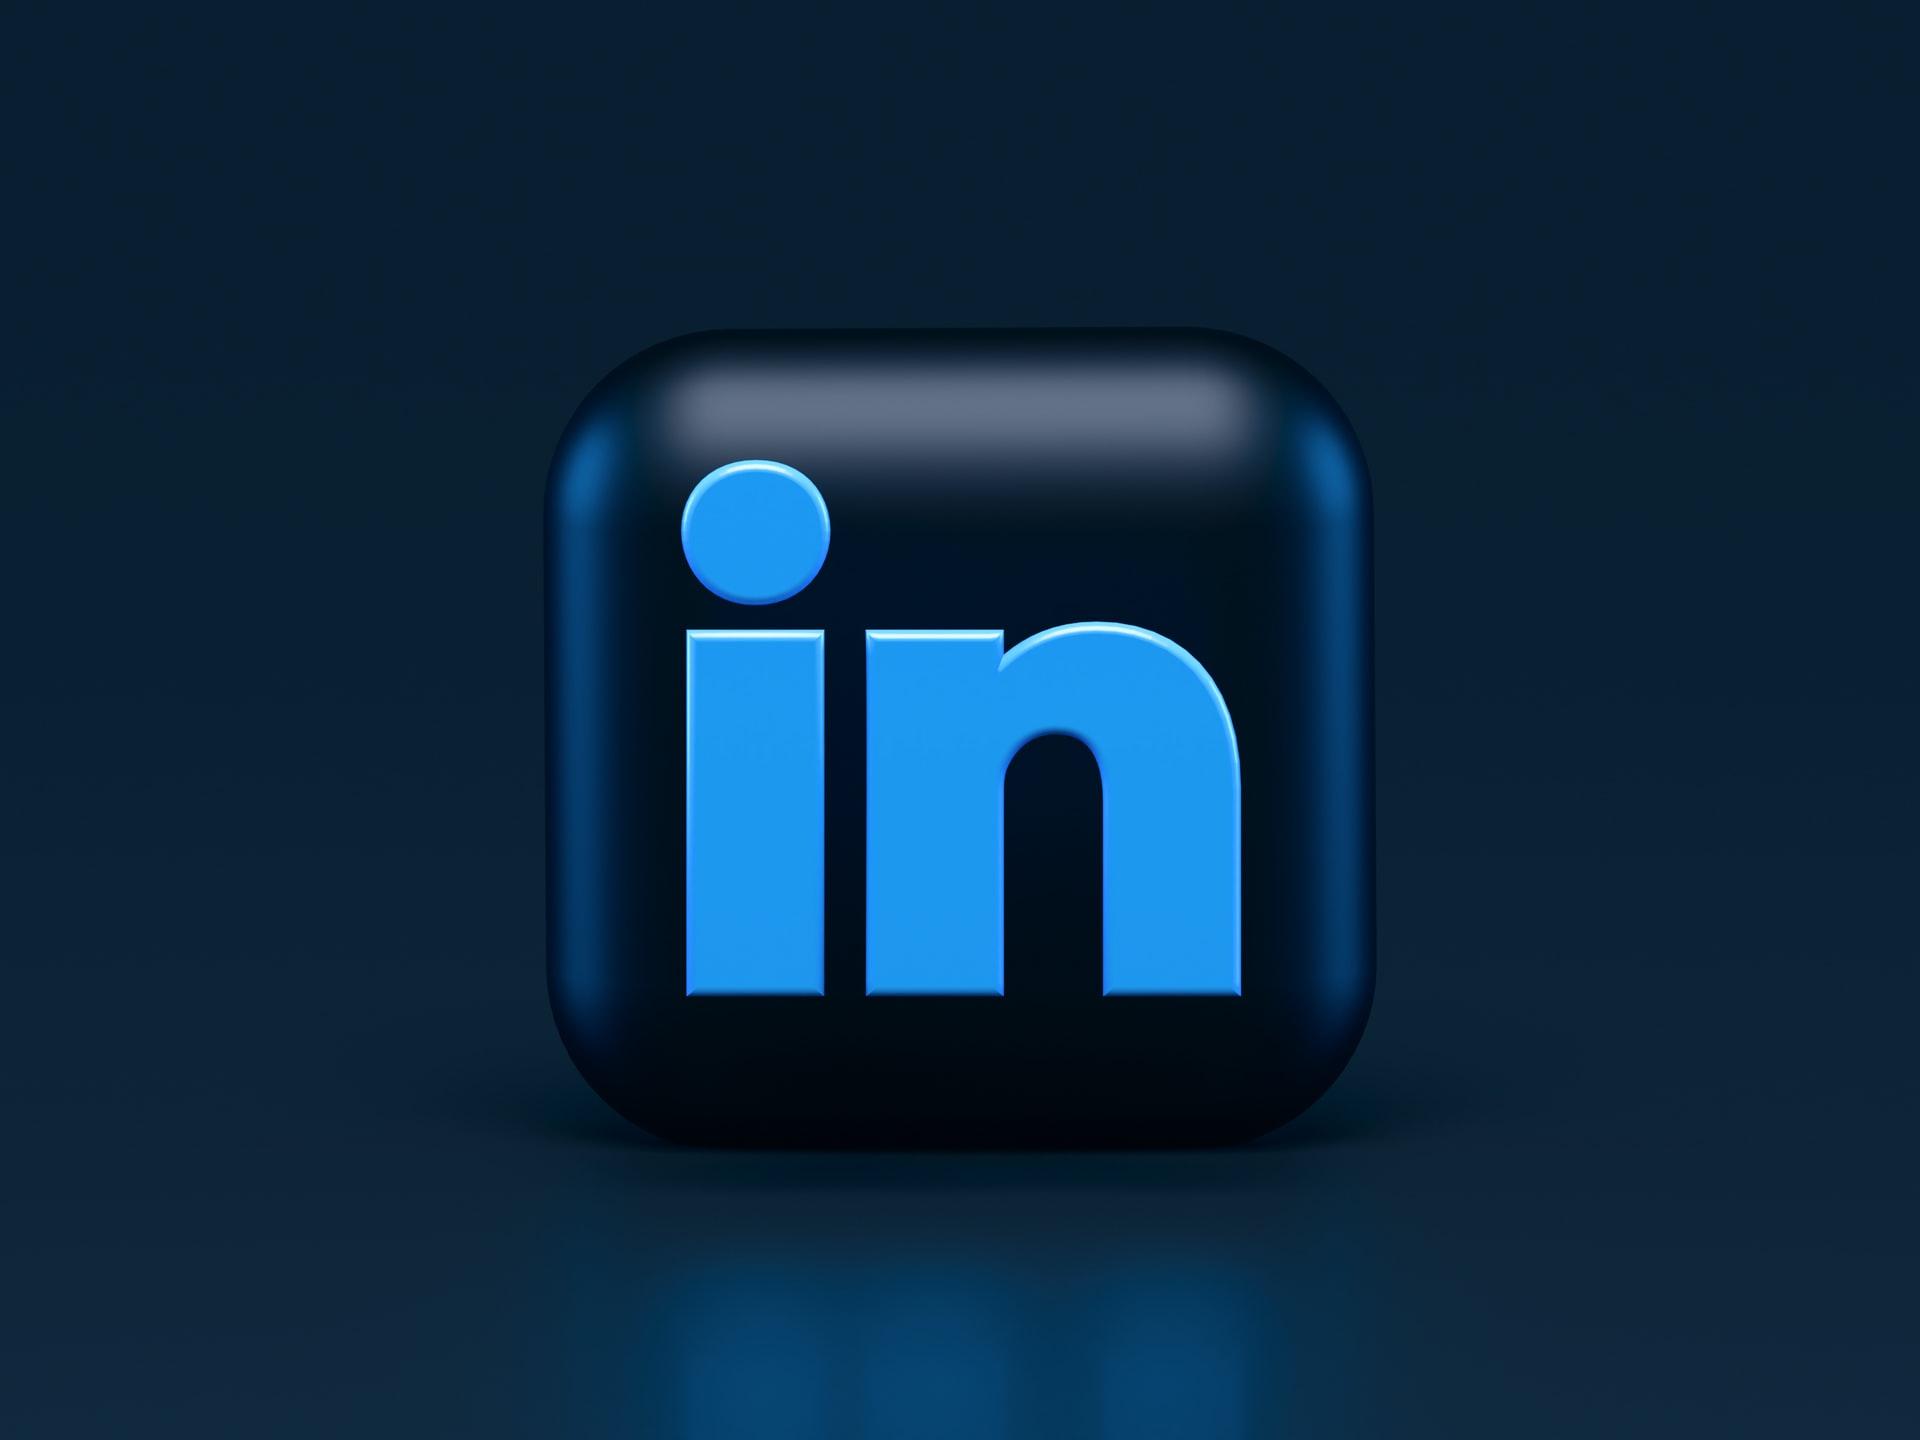 LinkedIn logo with blue background